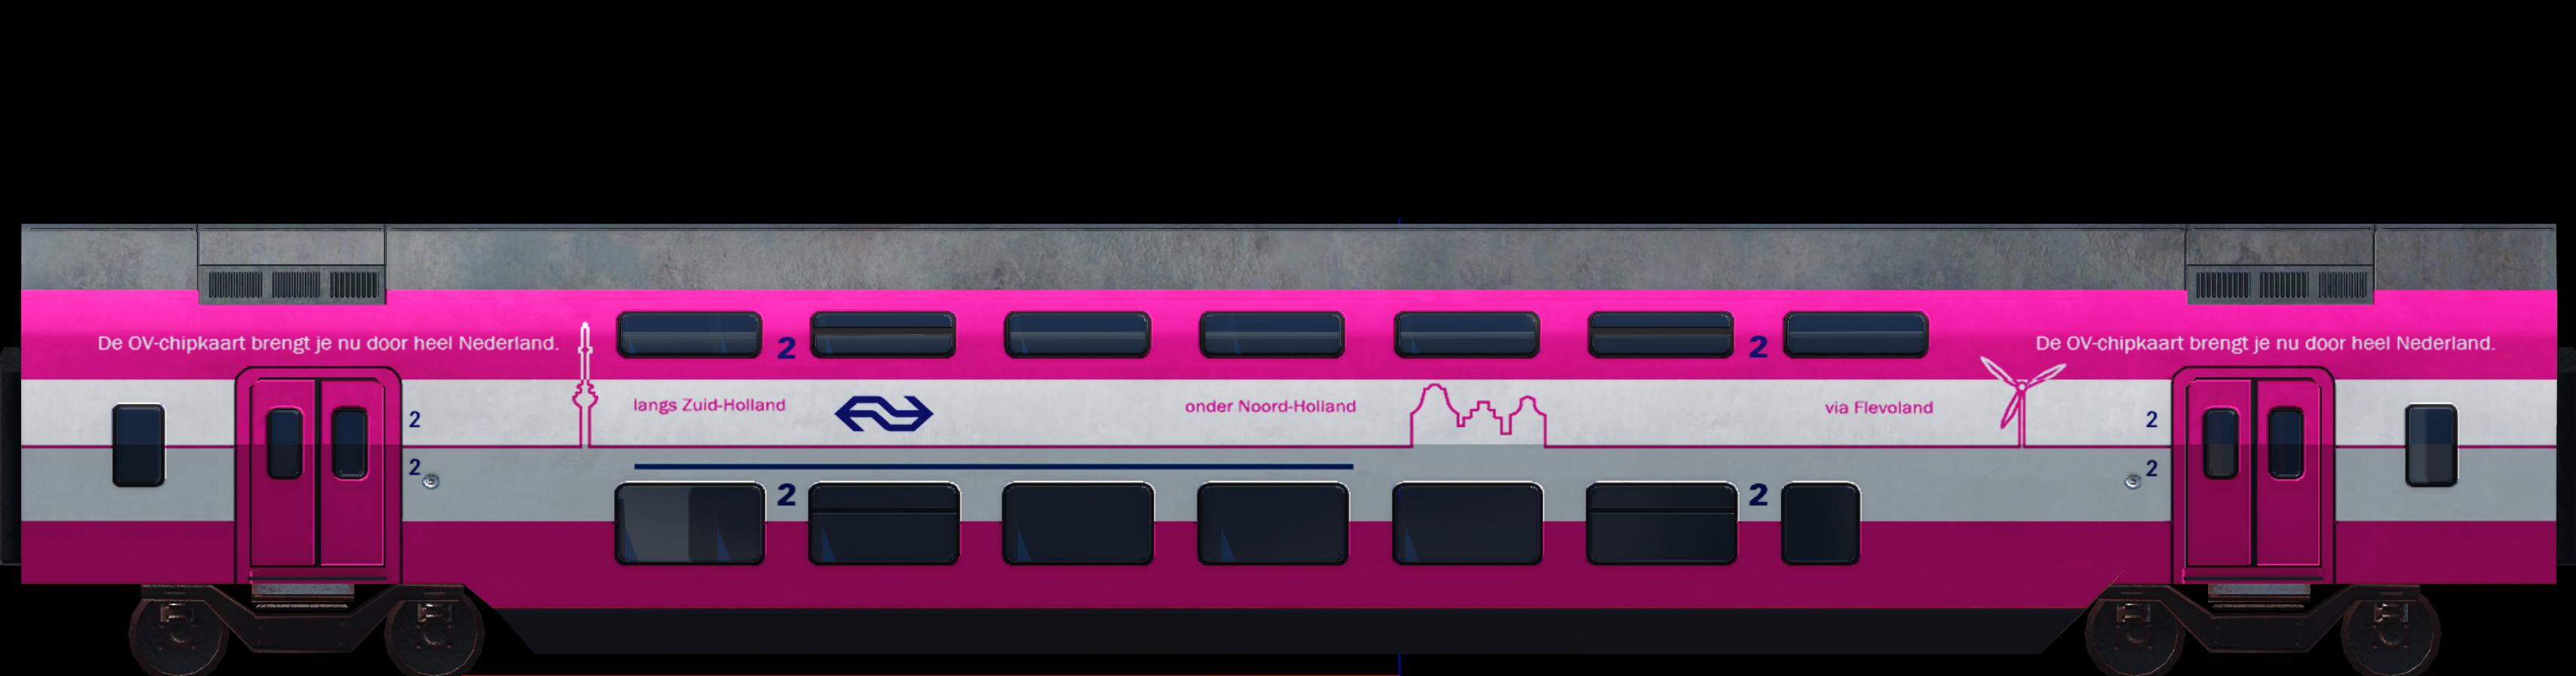 Transport Fever 2 - NS VIRM: OV Chipkaart